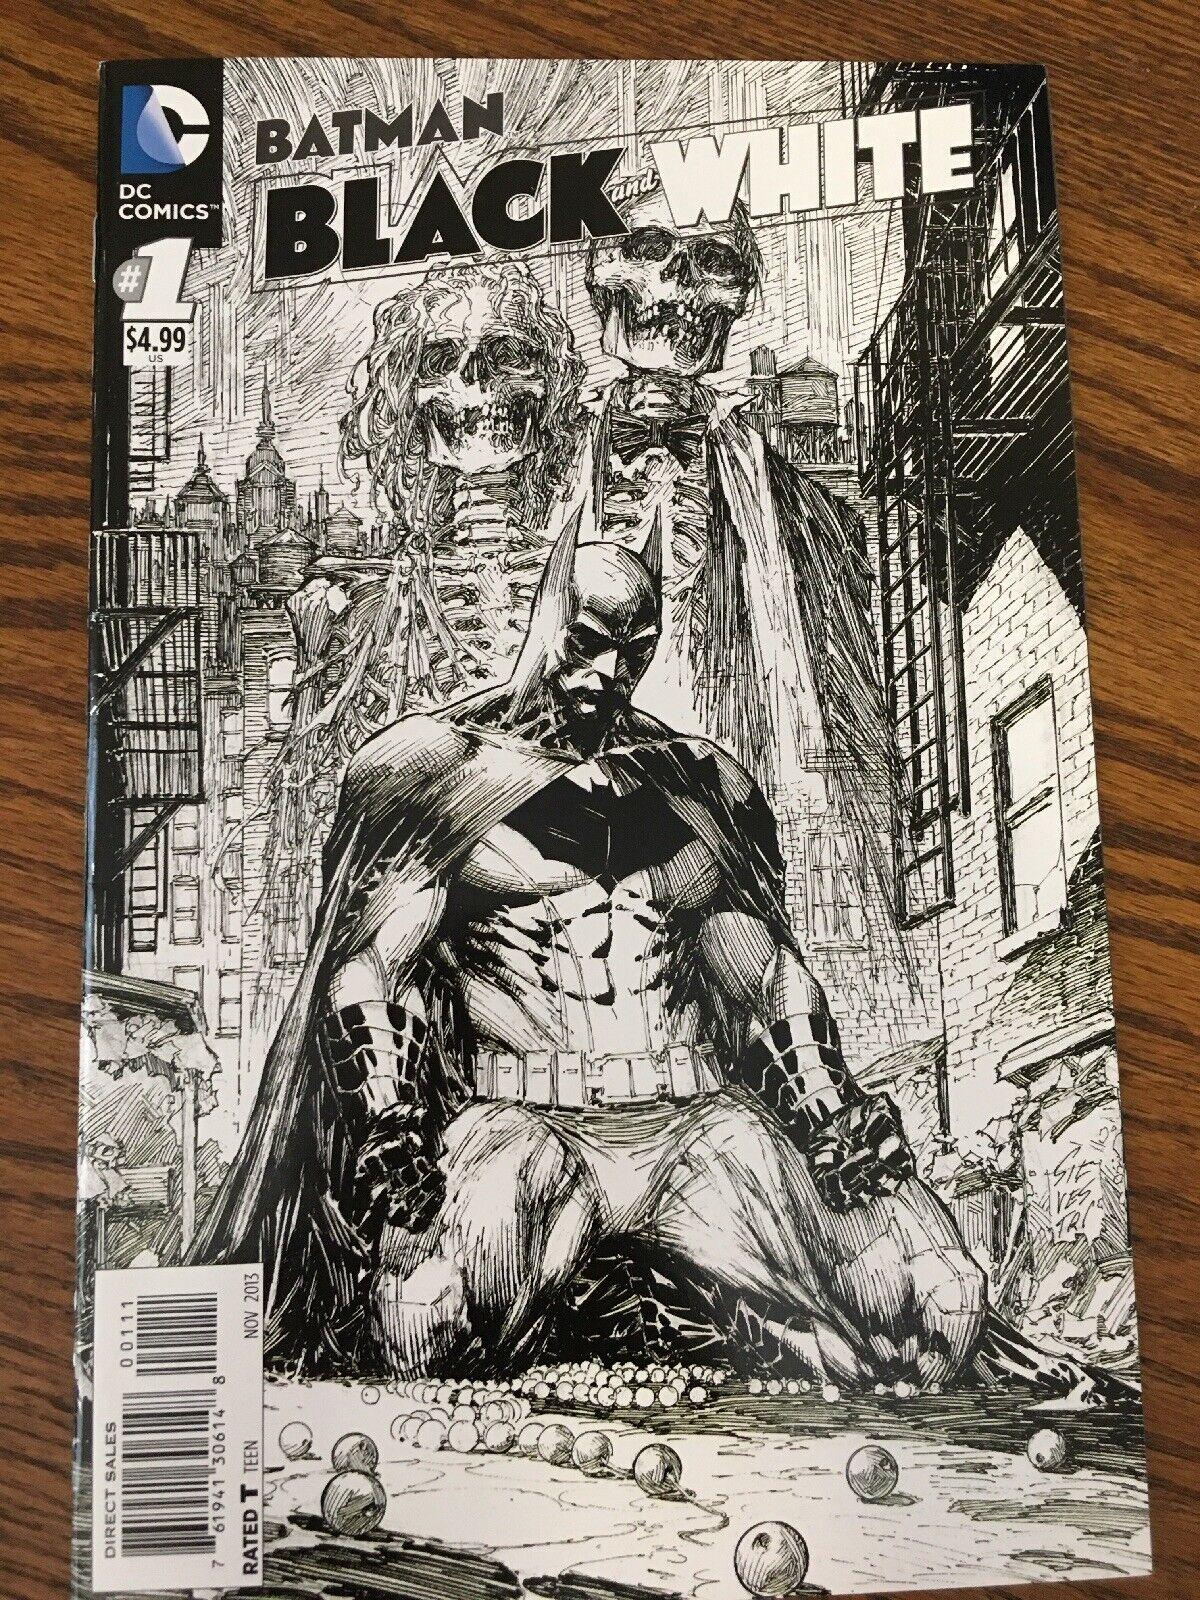 BATMAN BLACK AND WHITE #5 NEAR MINT 2013